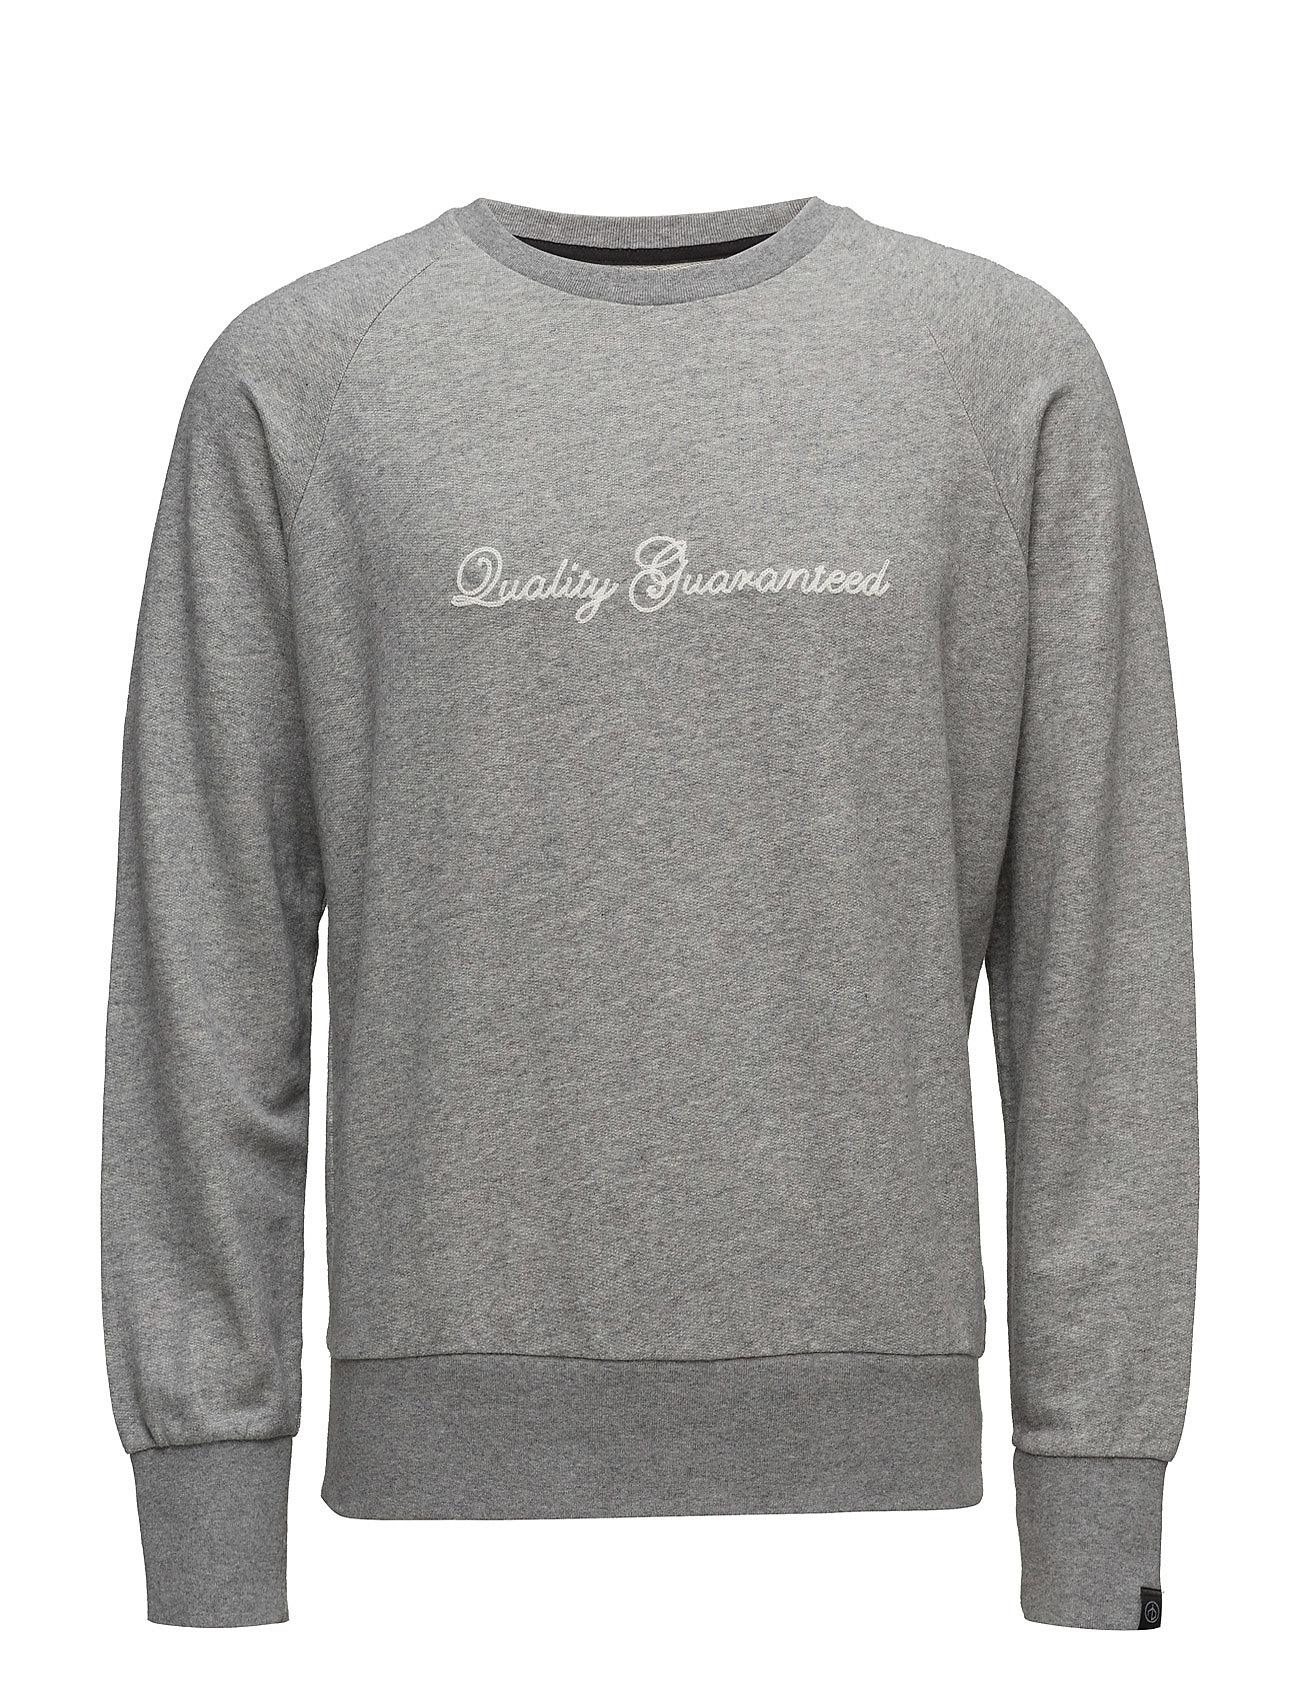 rag & bone Quality guaranteed sweatshirt fra boozt.com dk